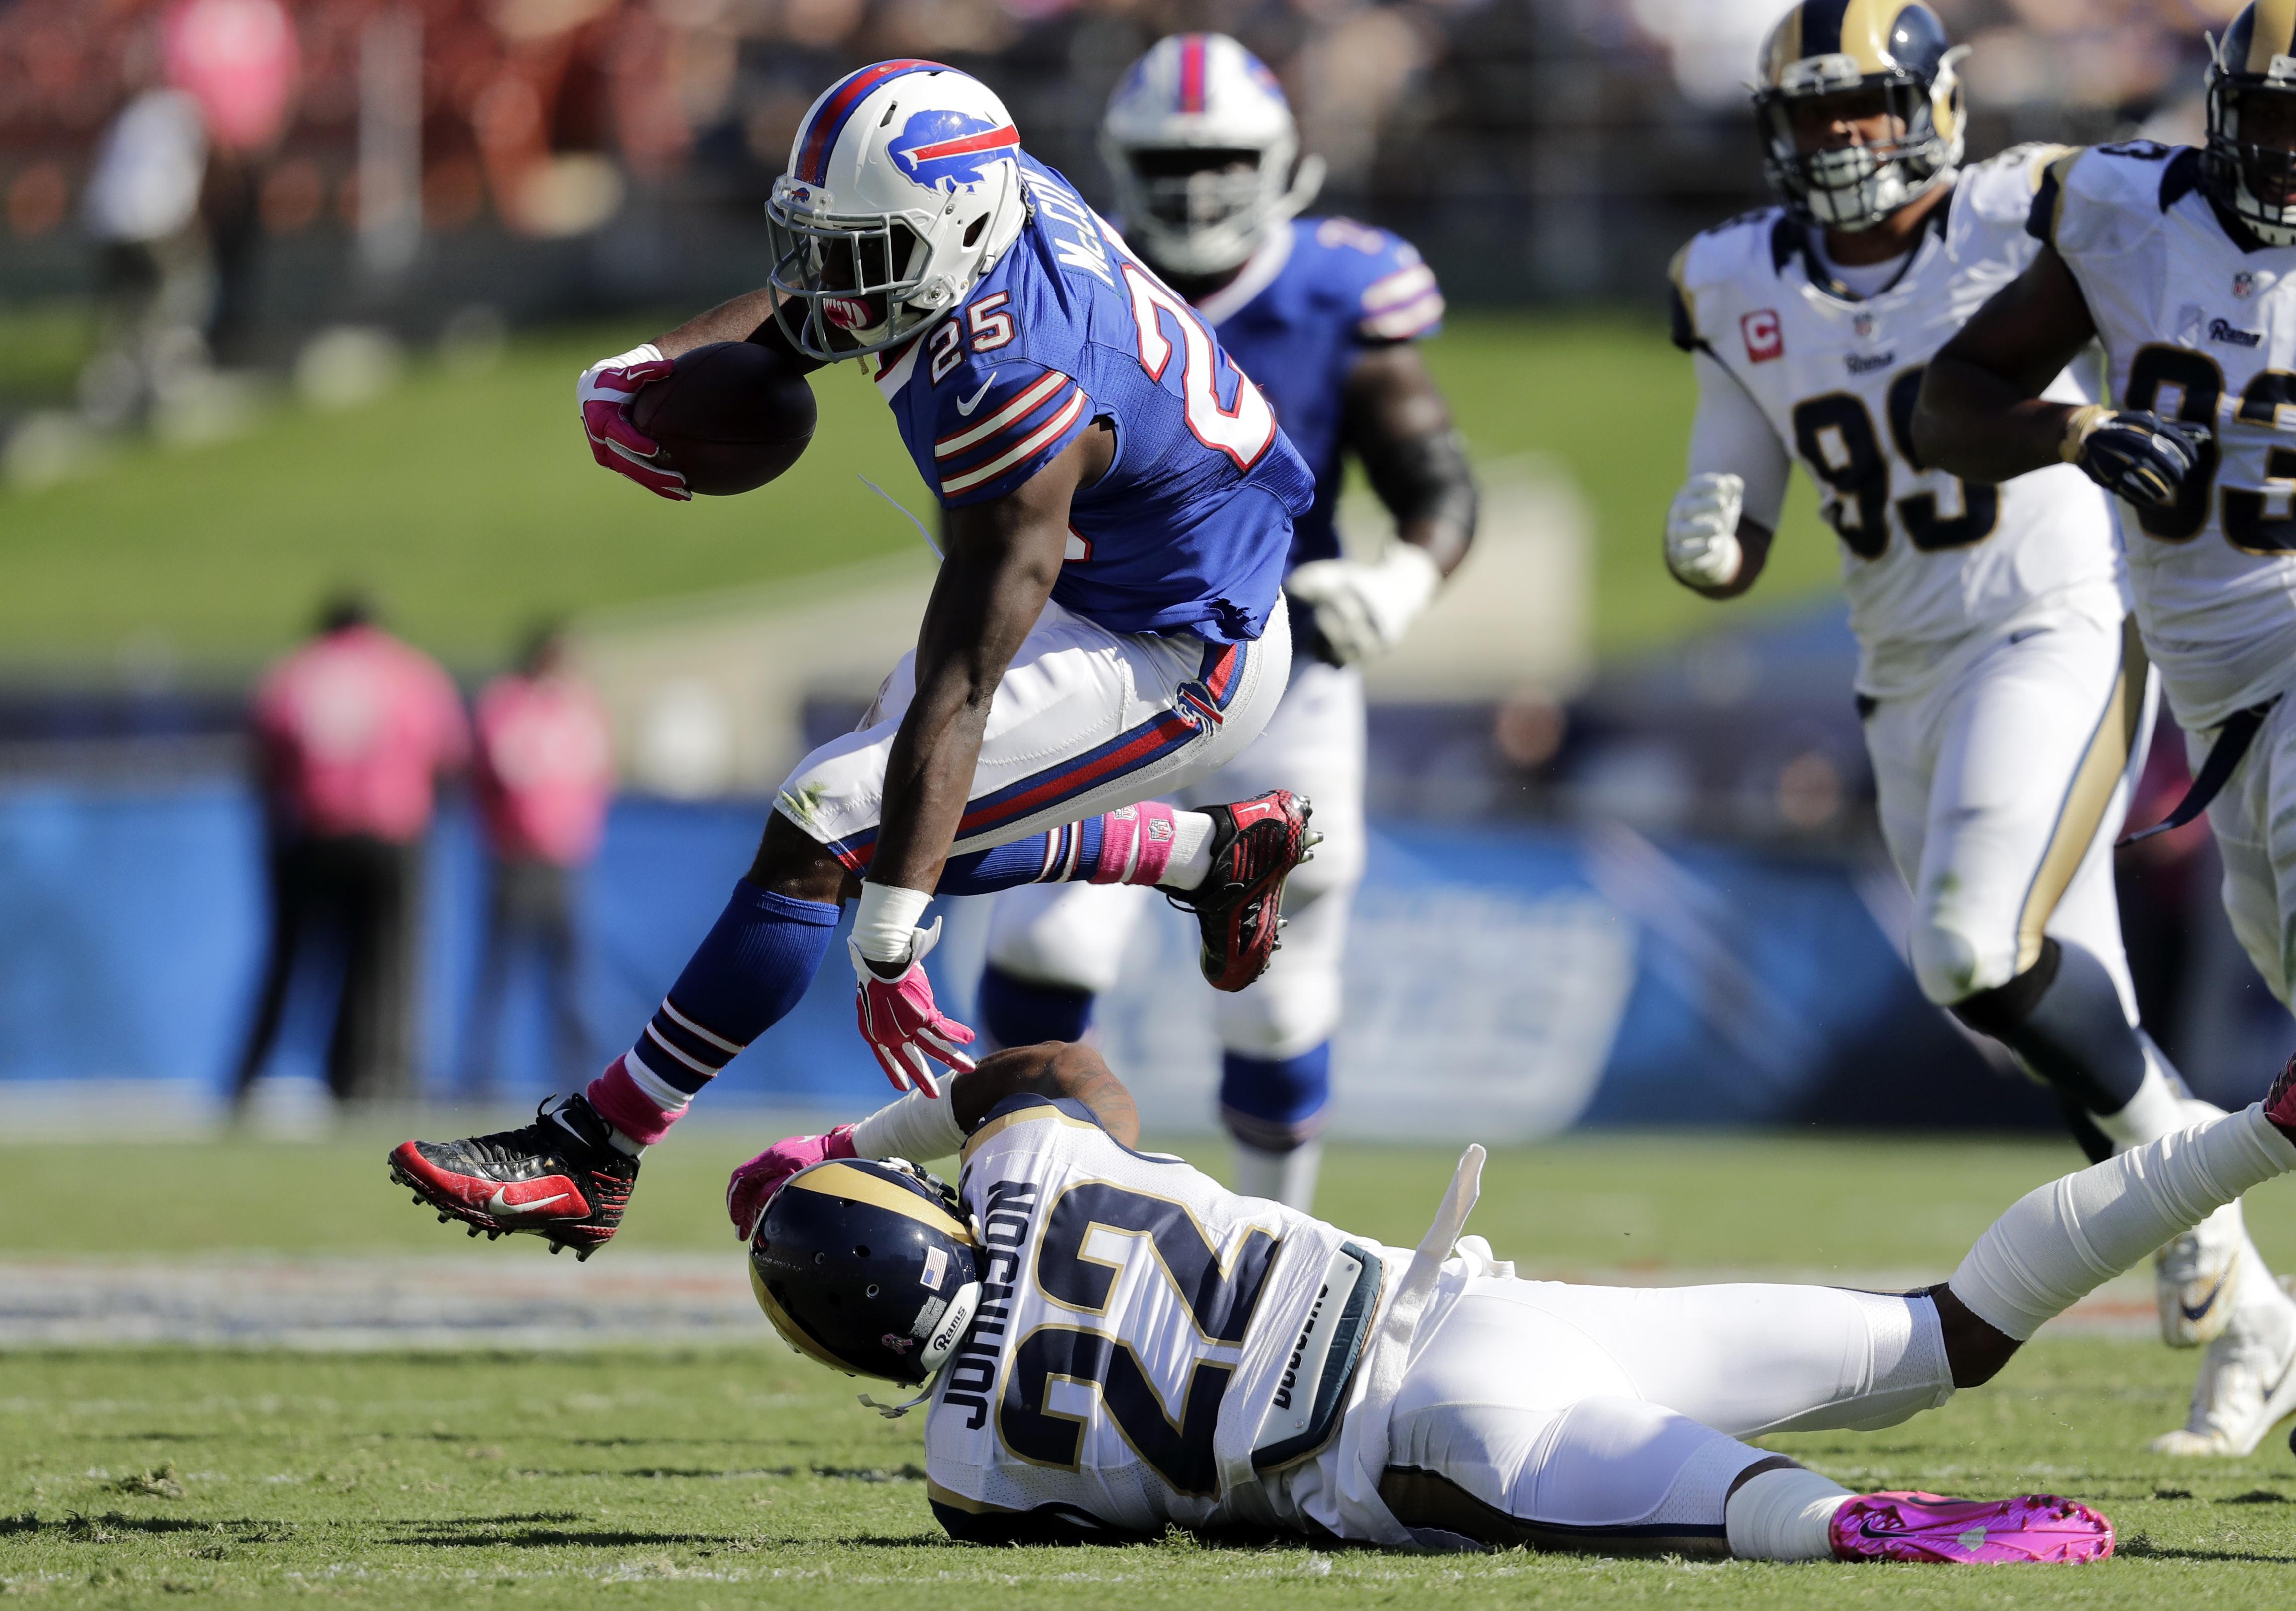 Buffalo Bills running back LeSean McCoy (25) runs past Los Angeles Rams cornerback Trumaine Johnson (22) during the first half of an NFL football game, Sunday, Oct. 9, 2016, in Los Angeles. (AP Photo/Jae C. Hong)